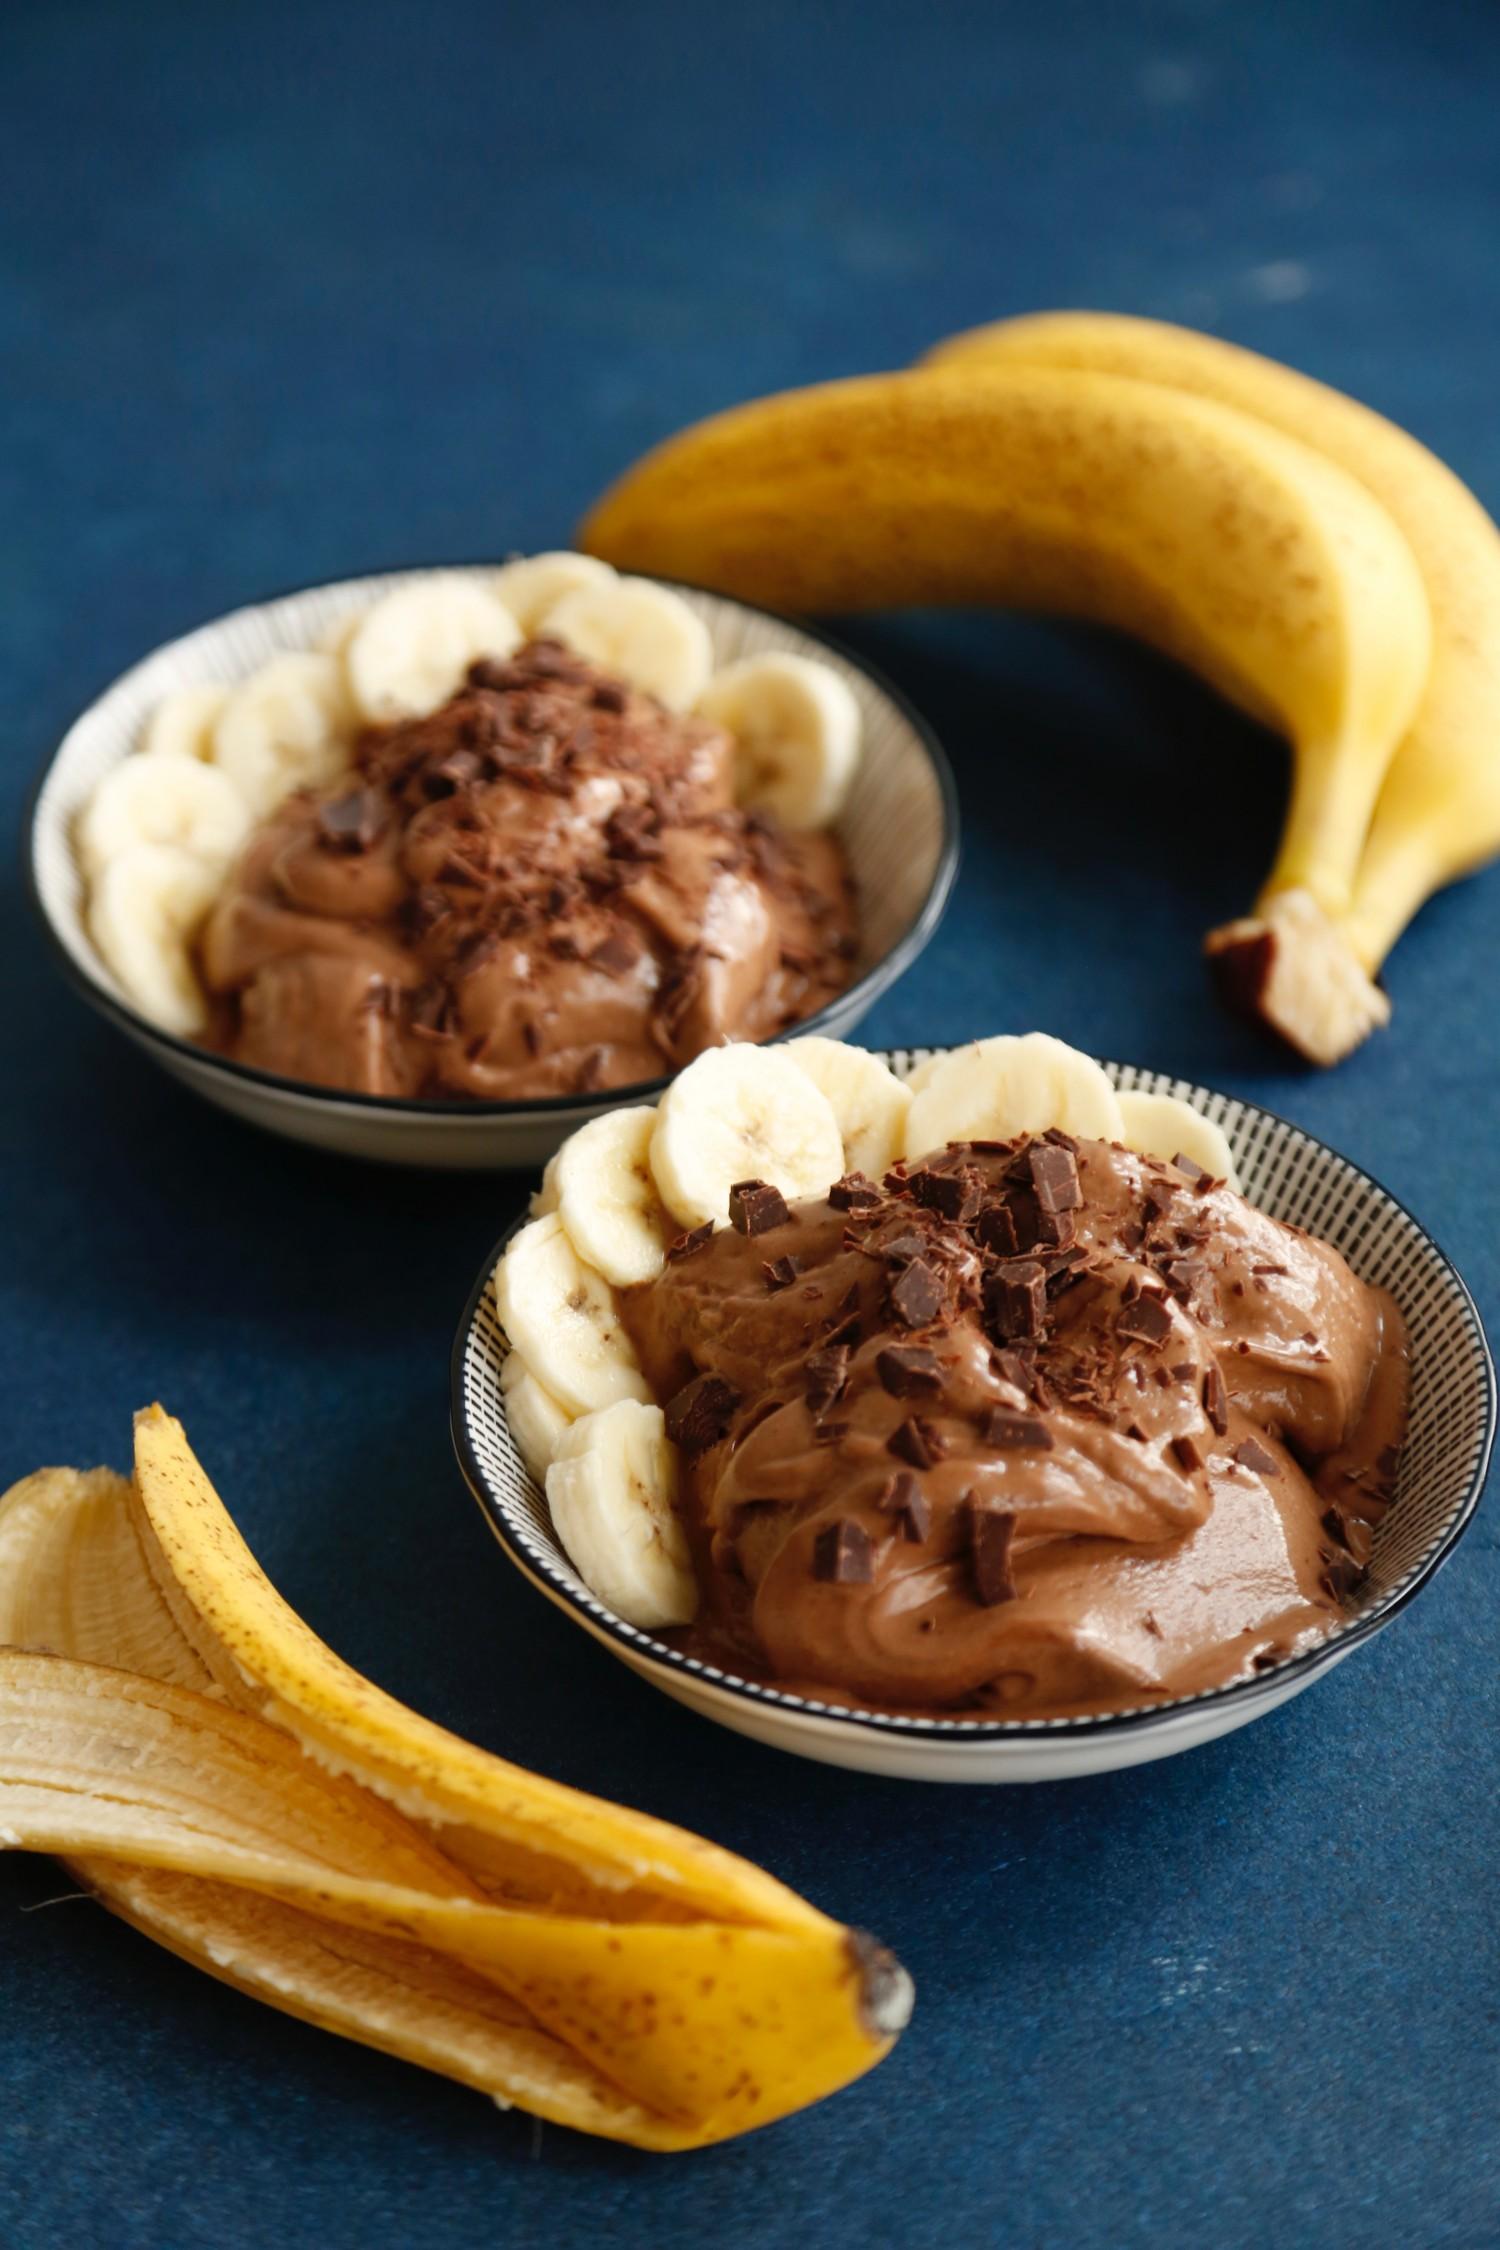 Peanutbutter nicecream med chokolade4